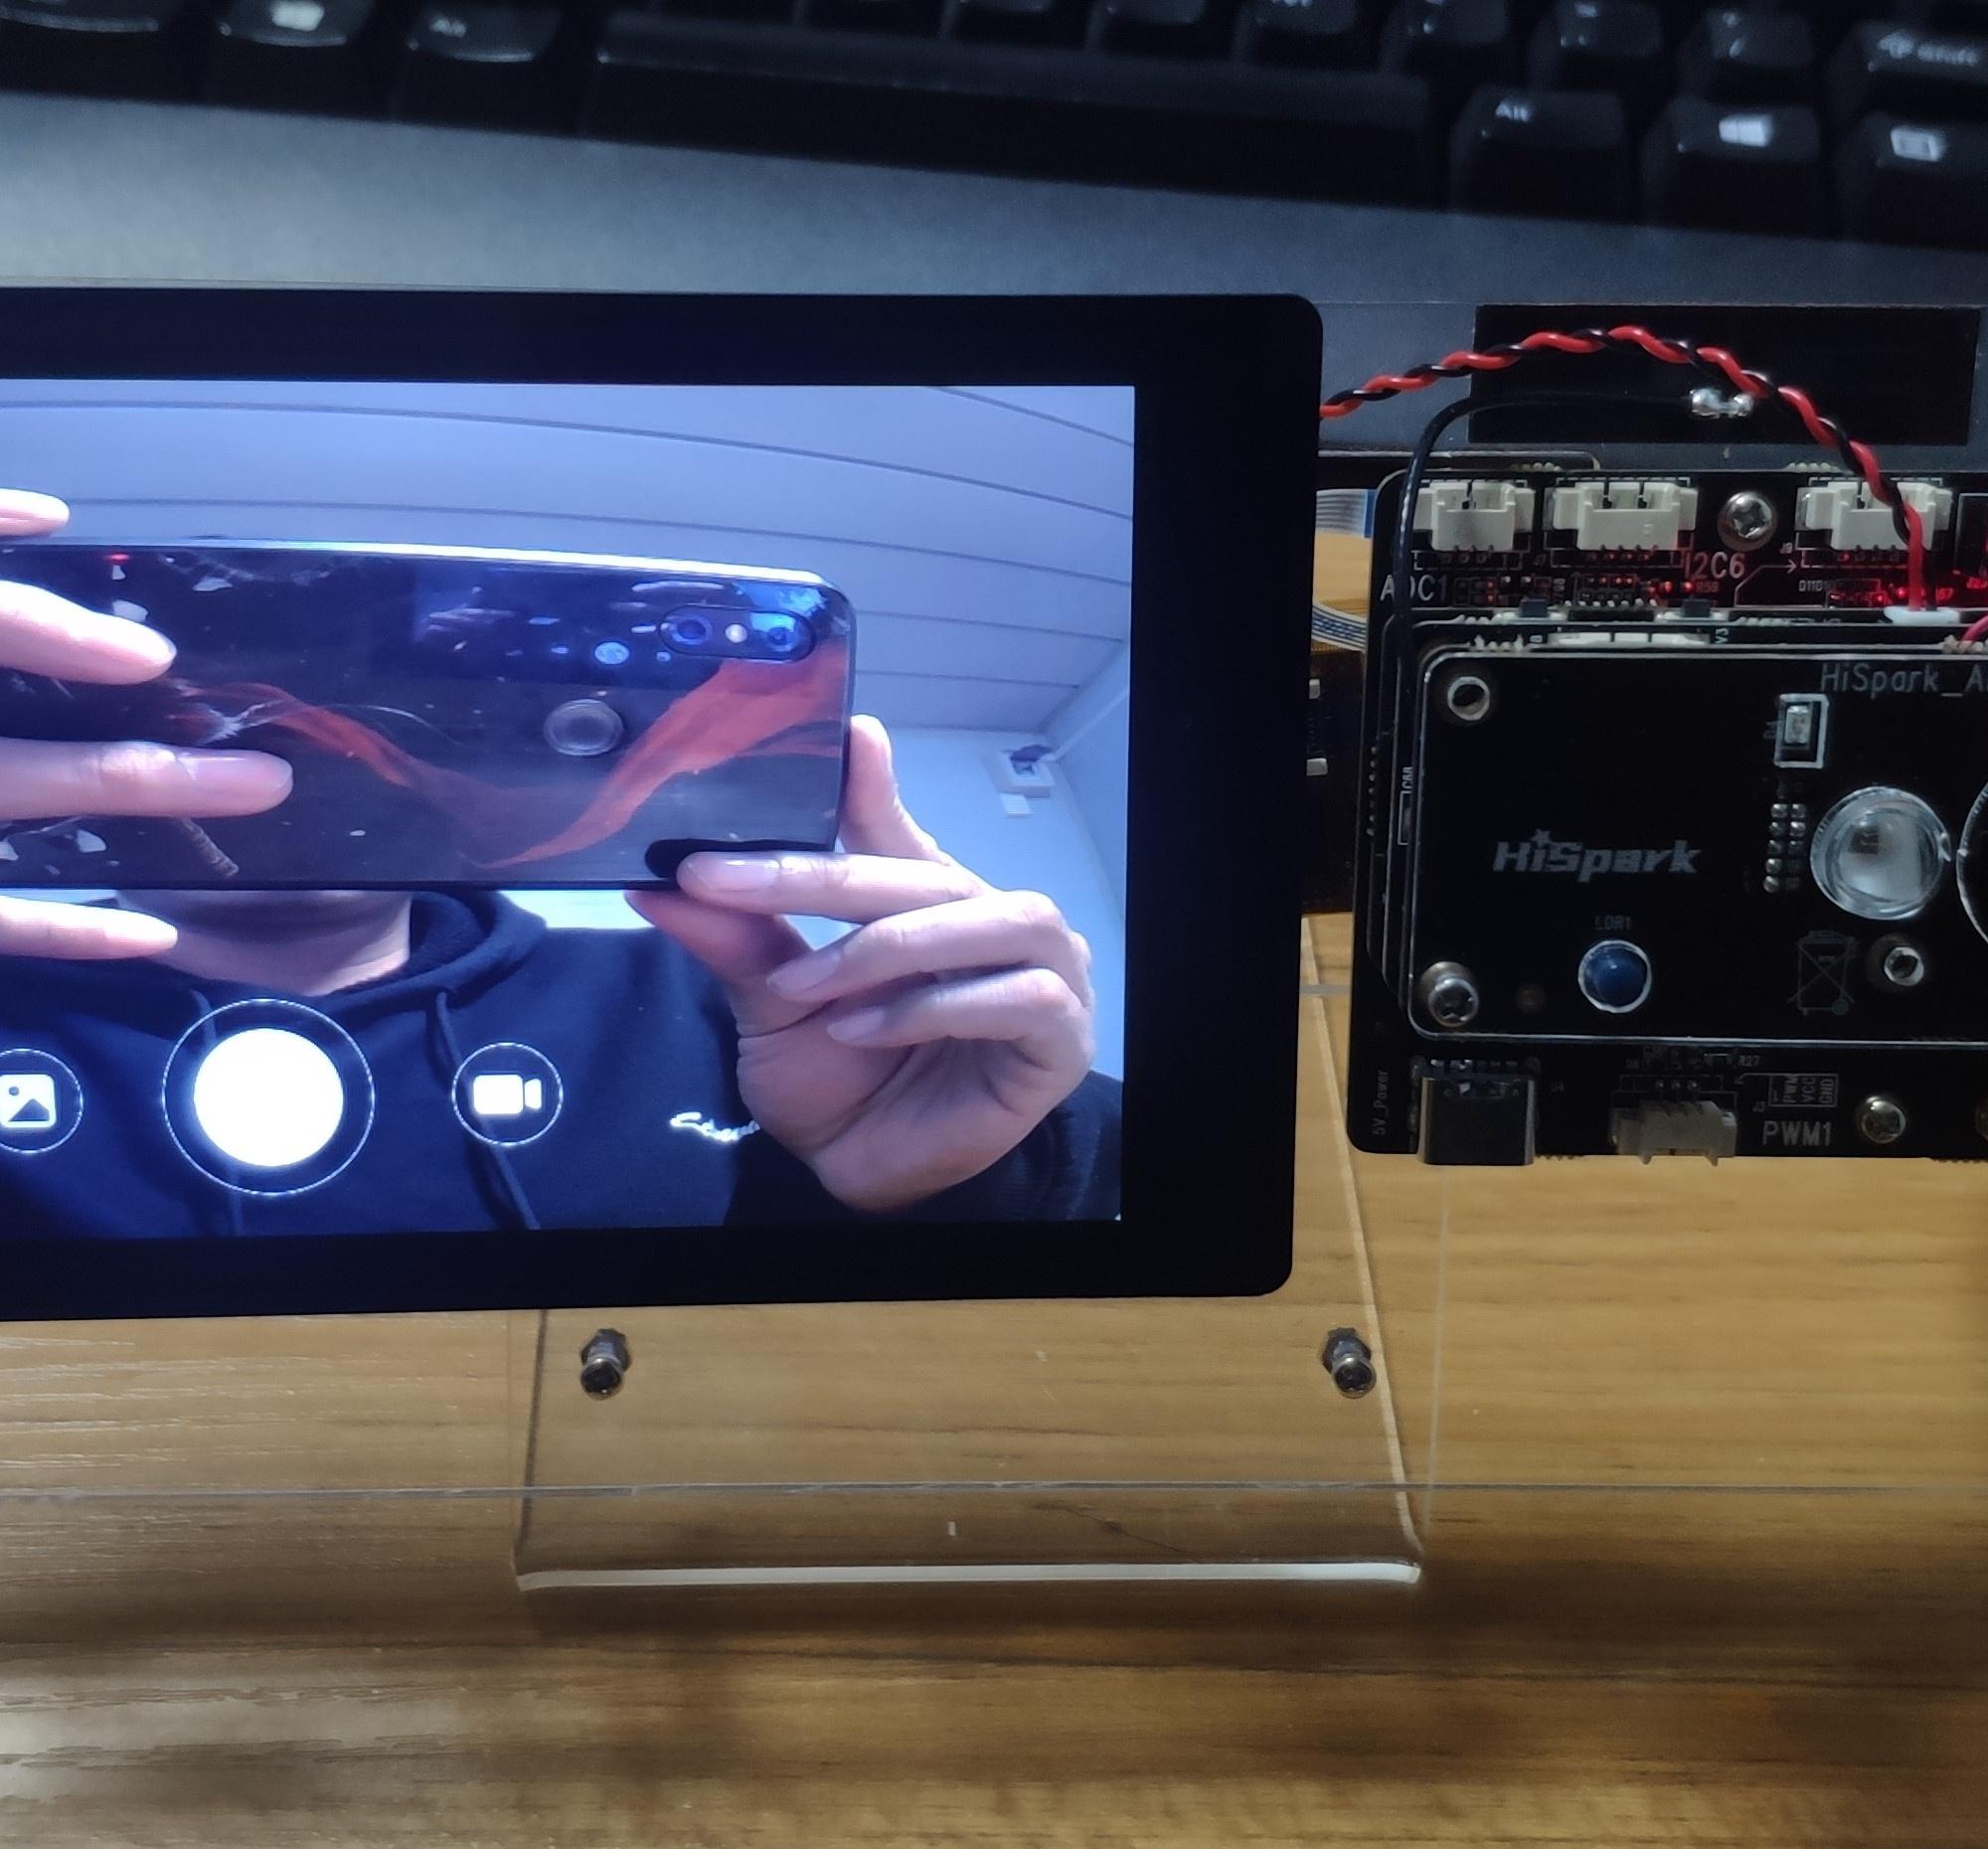 【HarmonyOS HiSpark AI Camera试用连载 】第一篇:开箱报告